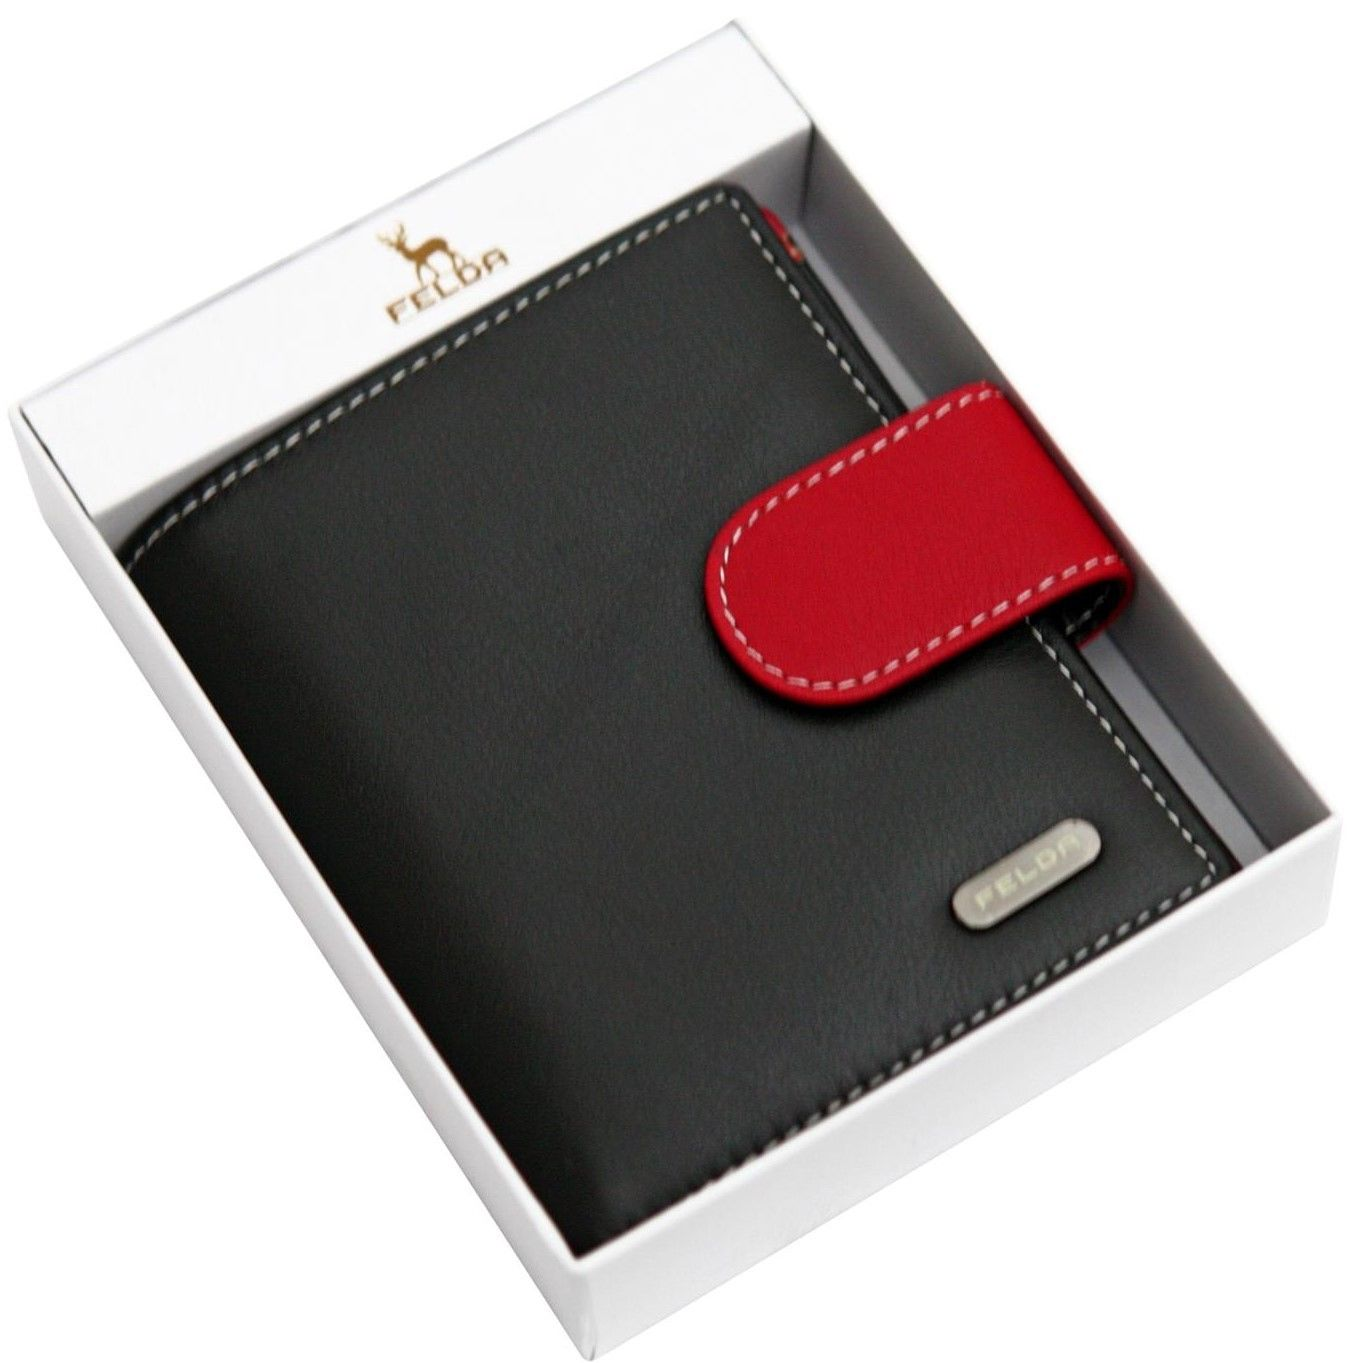 Felda-RFID-onorevoli-MEDAGLIA-amp-Card-Purse-Wallet-Genuine-Leather-Multi-SOFT-BOX-REGALO miniatura 17